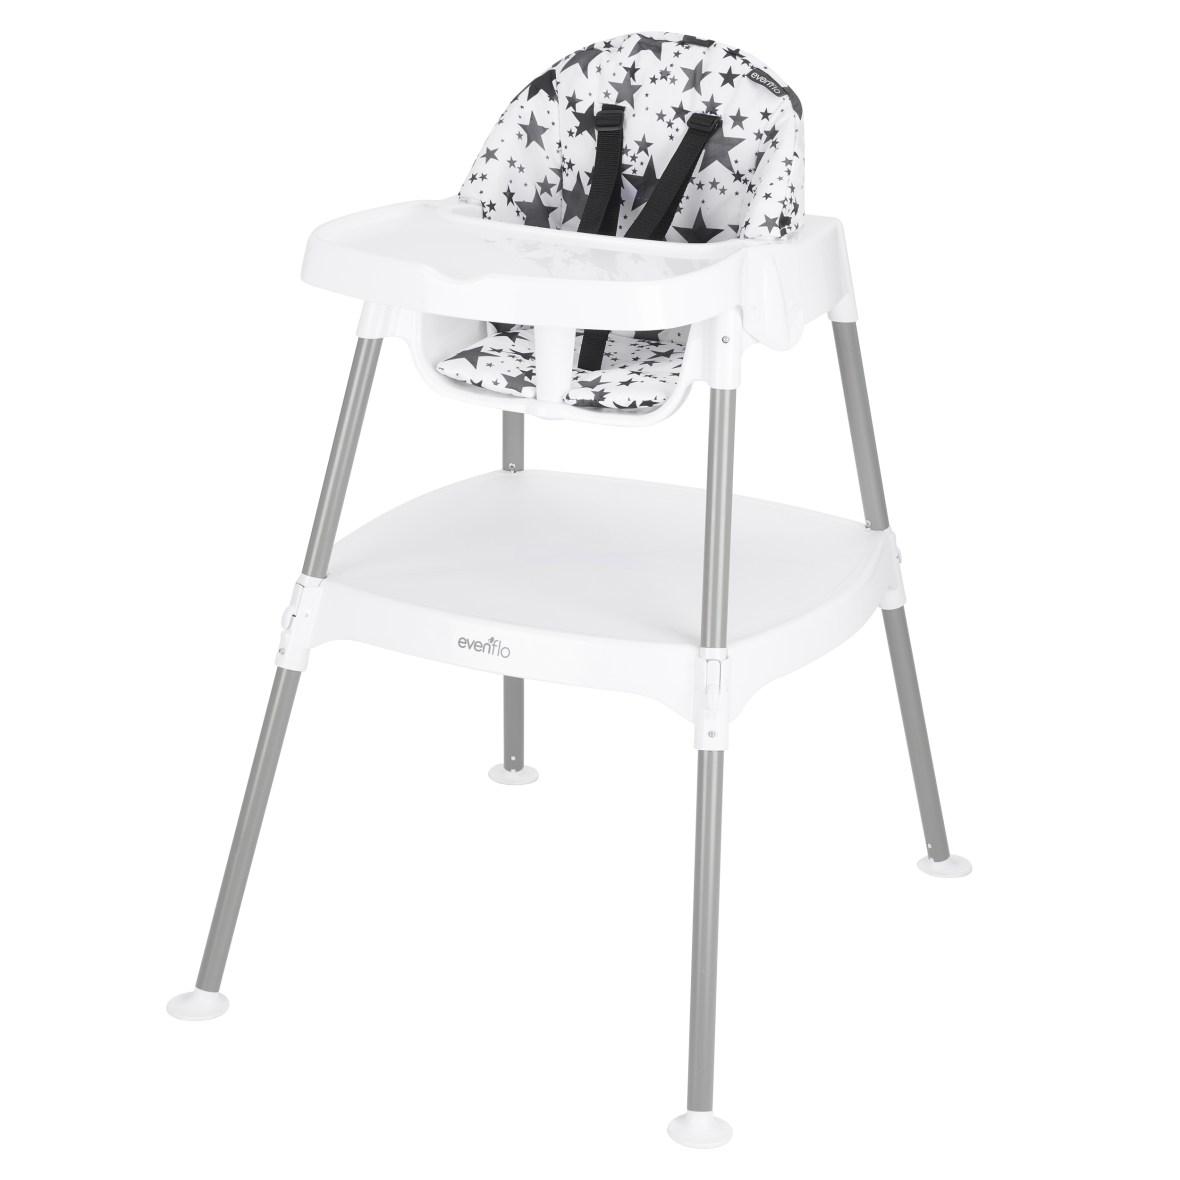 Evenflo 4-in-1 Convertible High Chair- Pop Star